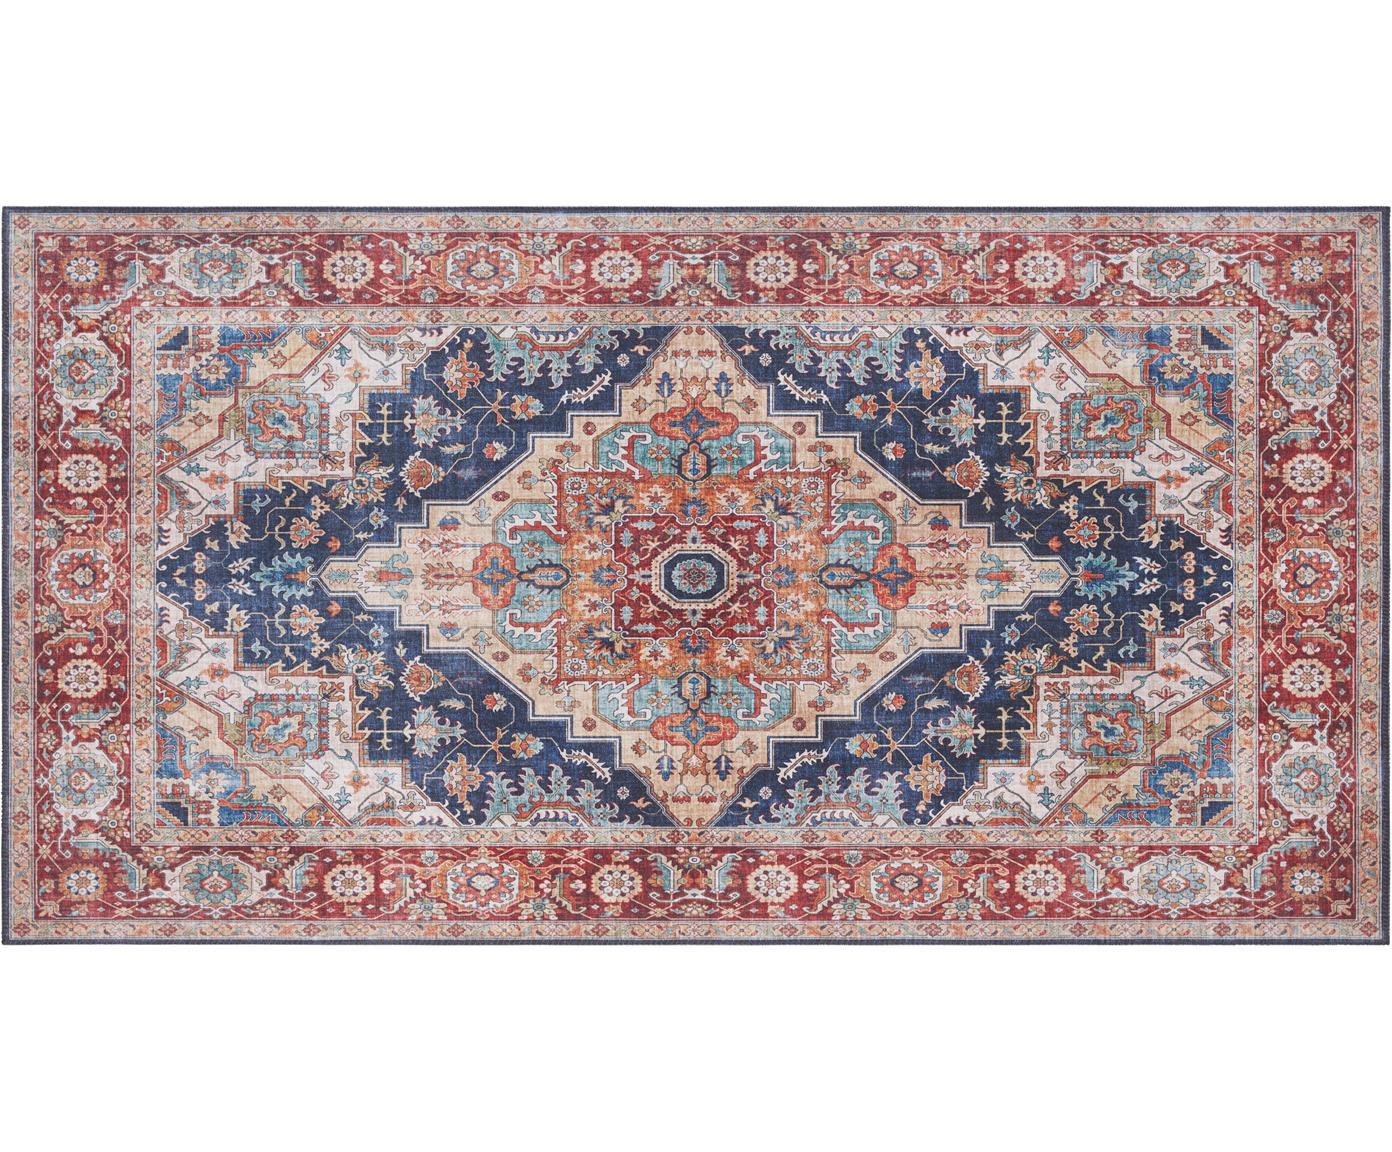 Vloerkleed Sylla in vintage stijl, Polyester, Blauw, rood, B 80 x L 150 cm (maat XS)